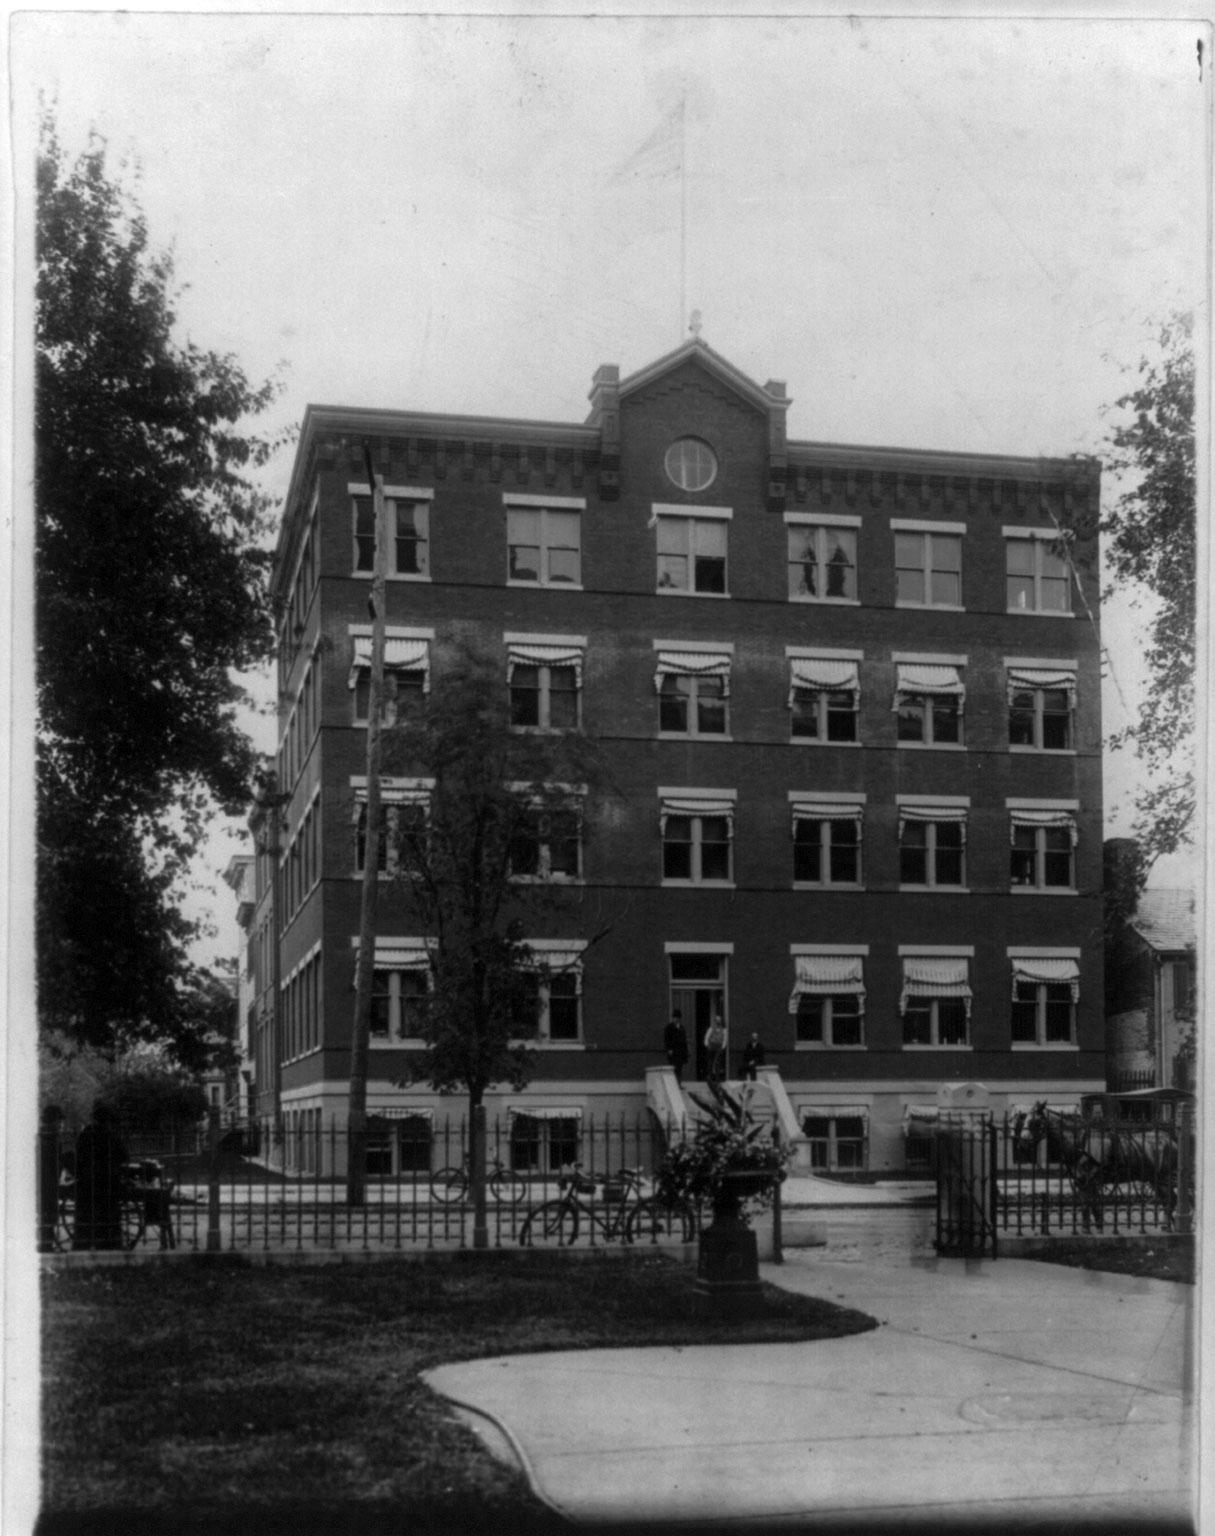 U.S. Bureau of Chemistry building, Wash., D.C. Circa 1900